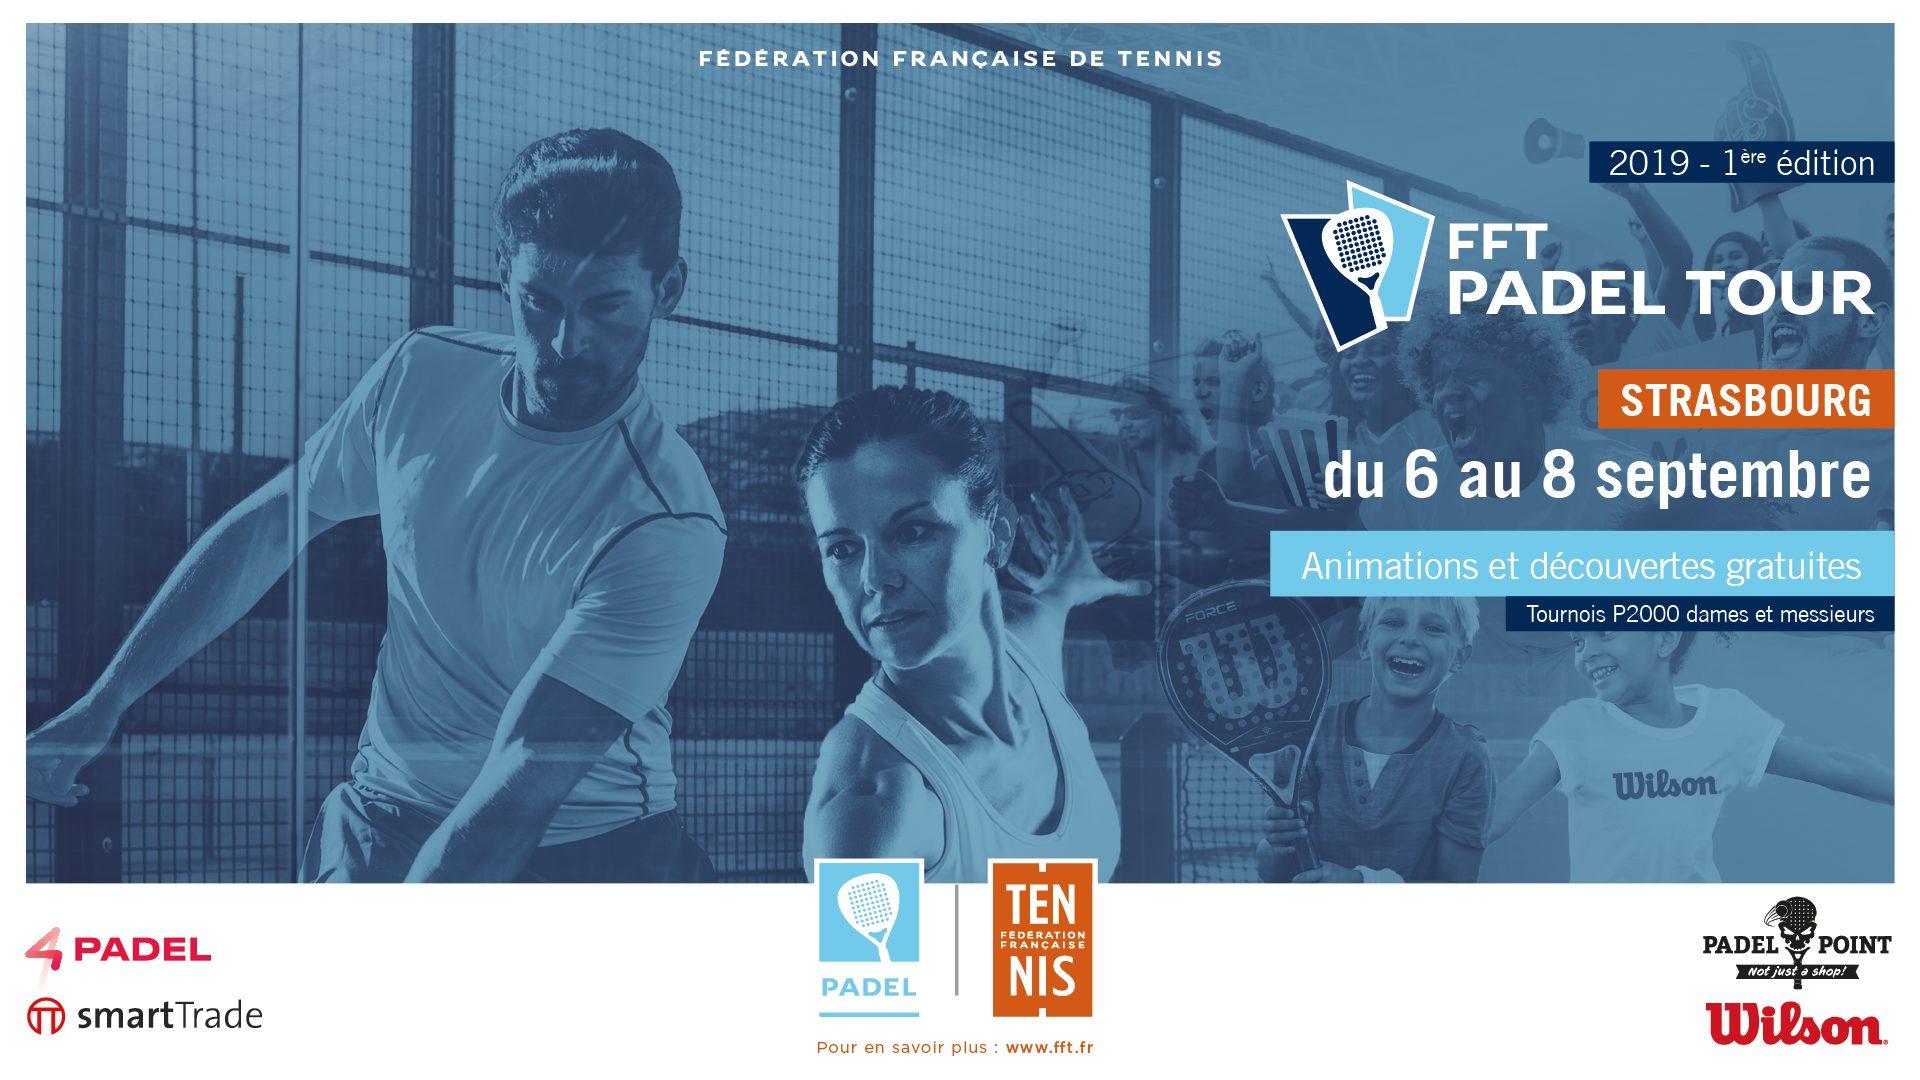 FFT Padel Tour 2019 – Strasbourg – 4PADEL : Finale Dames – Godallier / Martin vs Vandaele / Soubrié